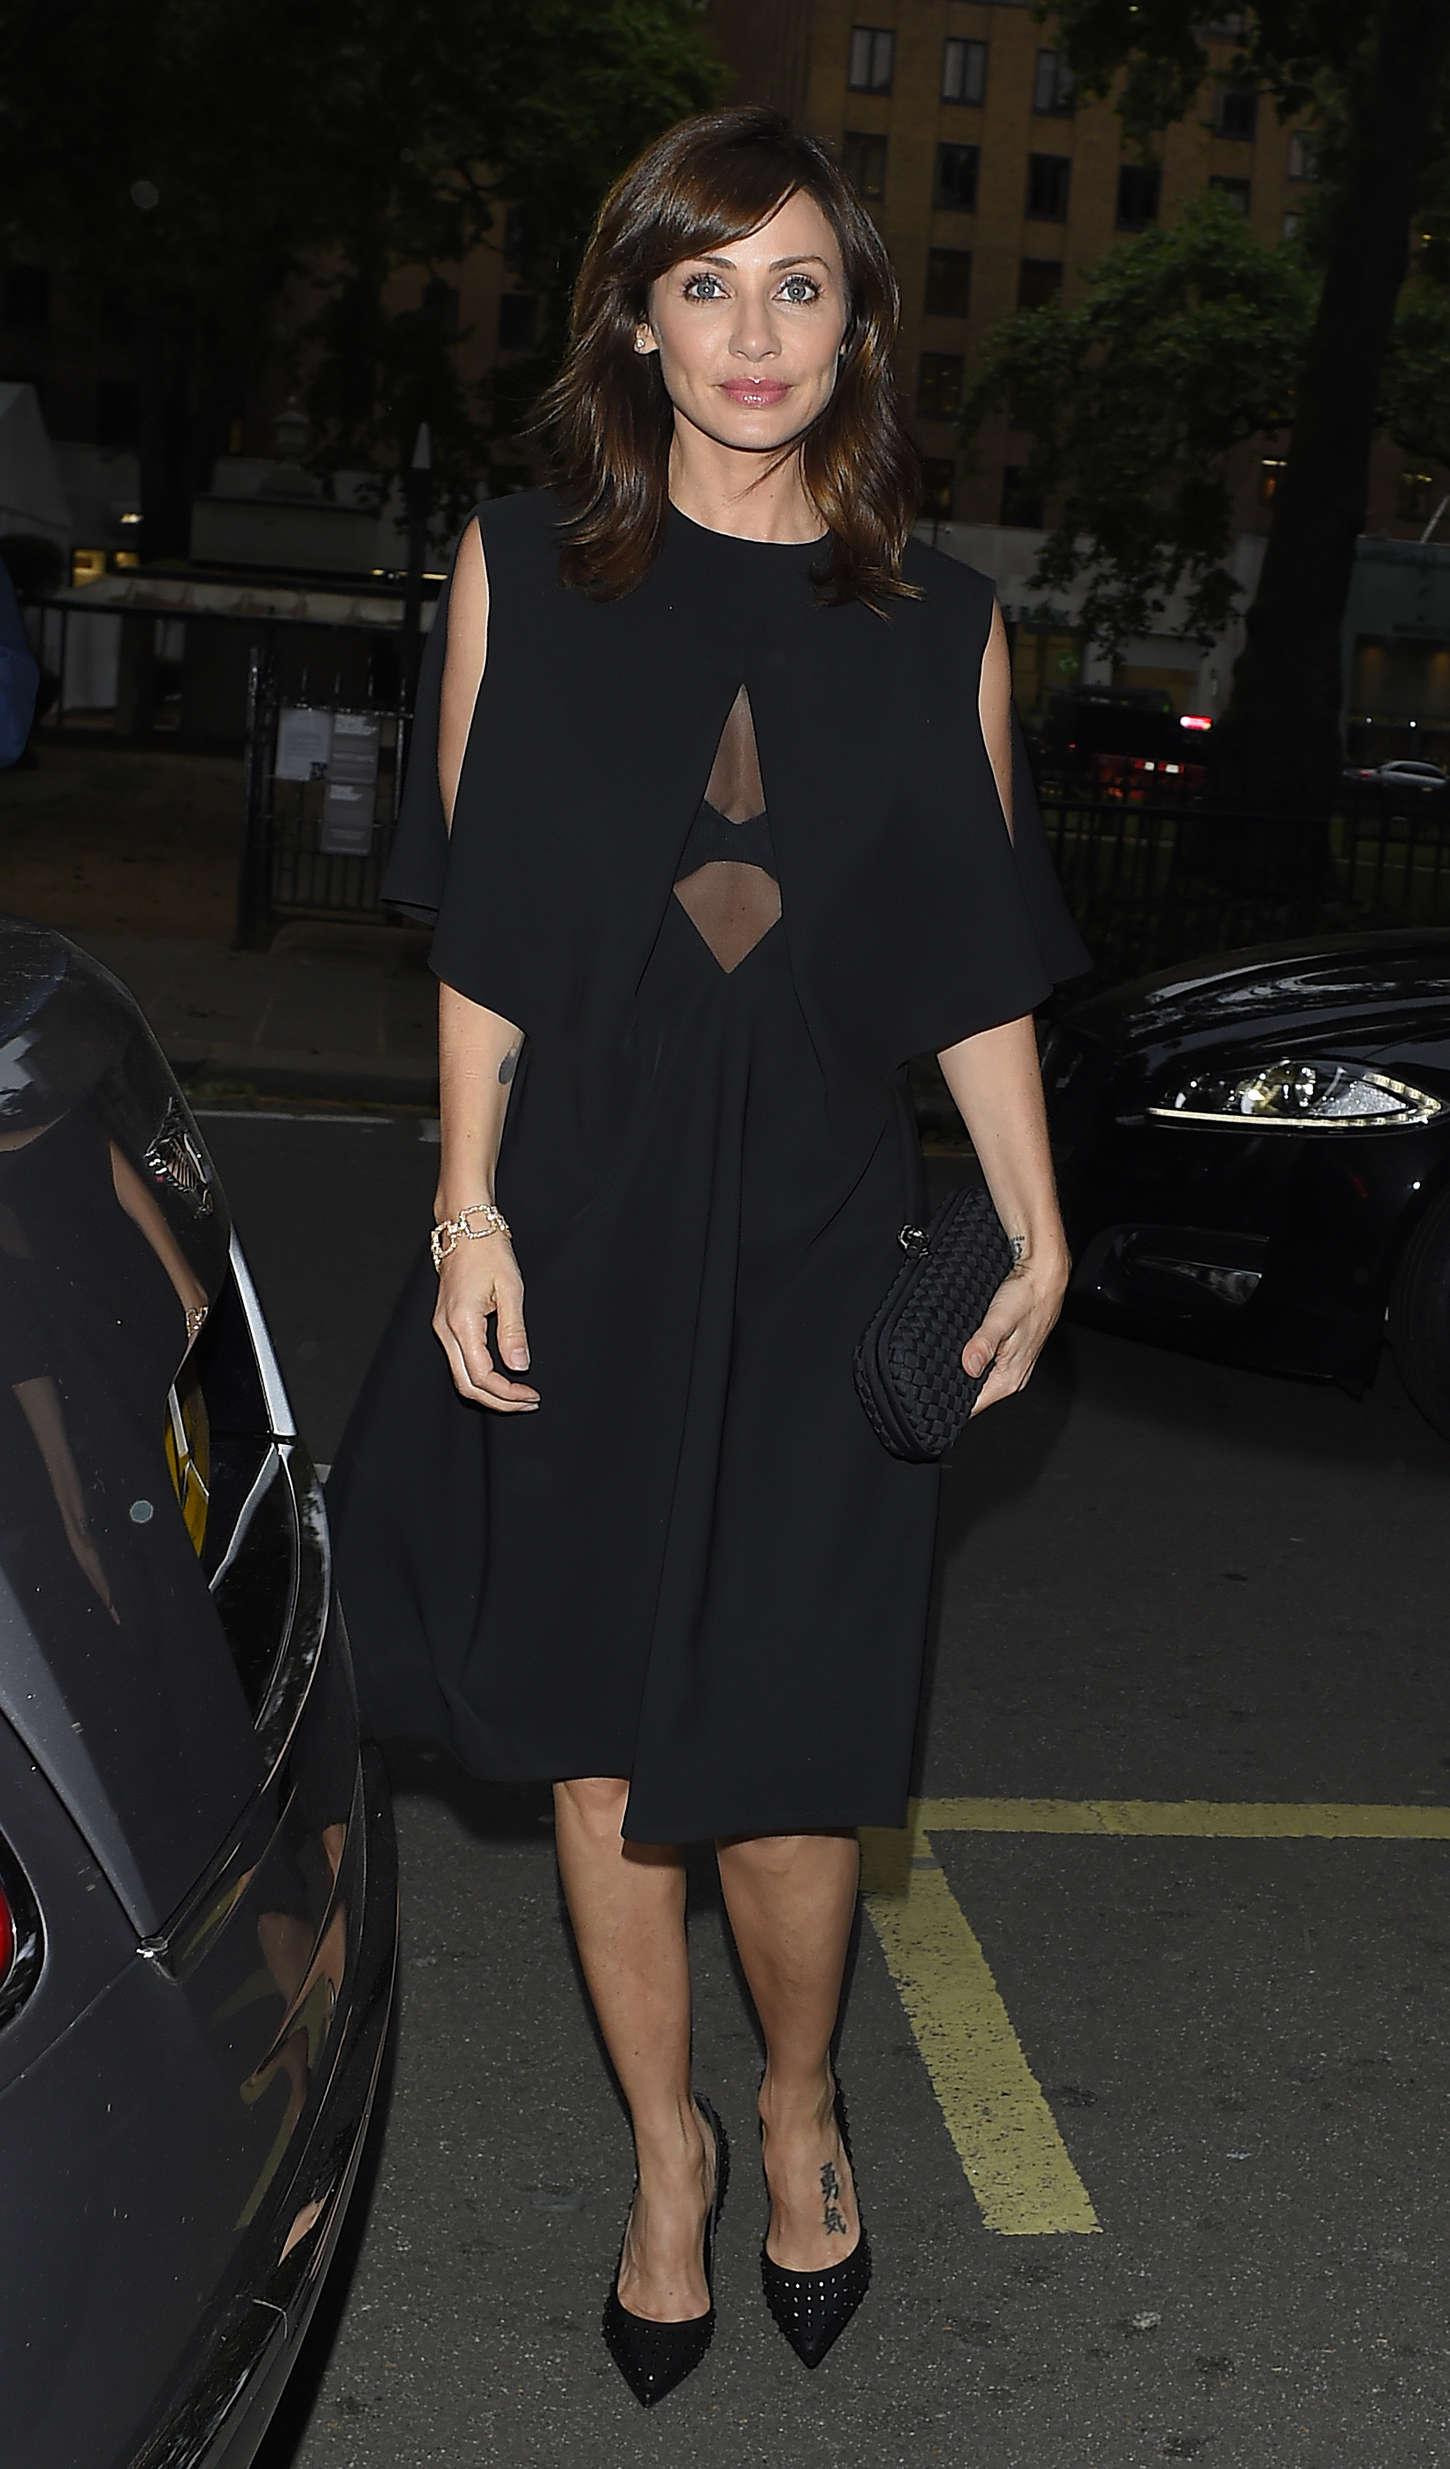 Natalie Imbruglia 2015 : Natalie Imbruglia: 2015 Hawn Foundation UK Fundraising Dinner -01